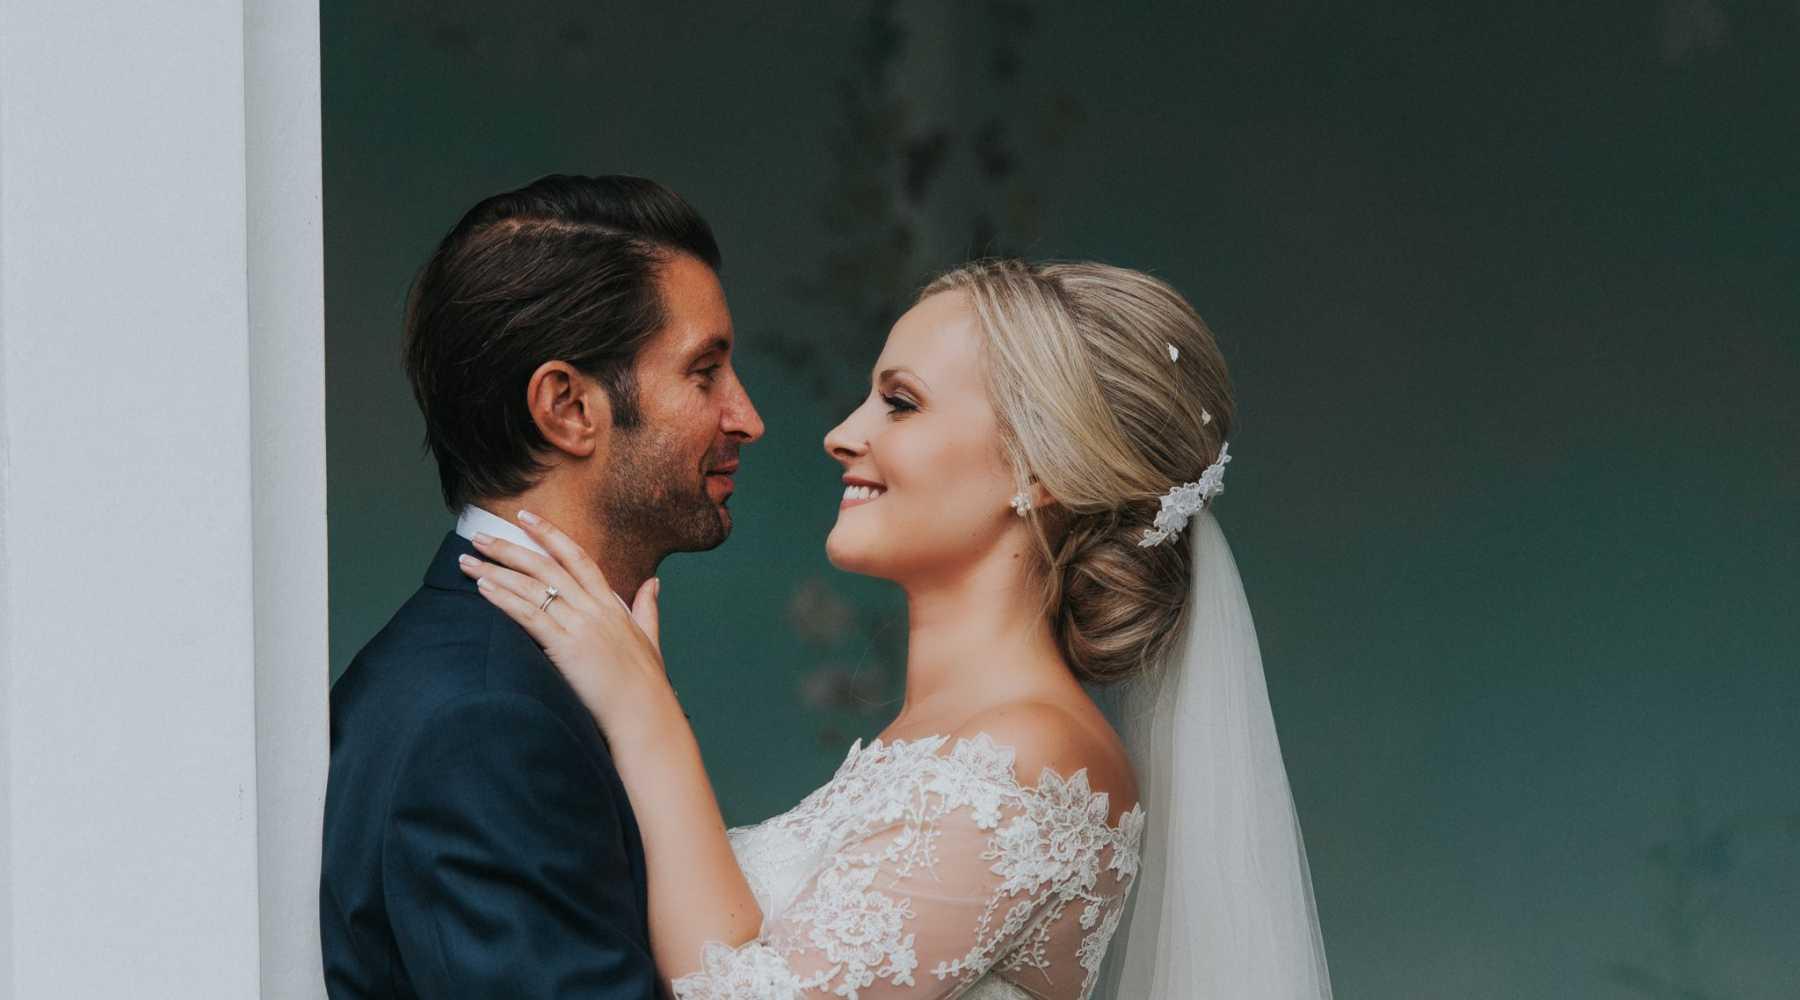 Congratulations, Best Day Ever, Wasing Park, Winchester Bridal boutique, best bridal boutique, Winchester wedding dress shop, hampshire bridal boutique, berkshire, reading, newbury, salisbury, wiltshire, surrey, west sussex, dorset, bournemouth, southampton, portsmouth, basingstoke, andover, bournemouth, poole